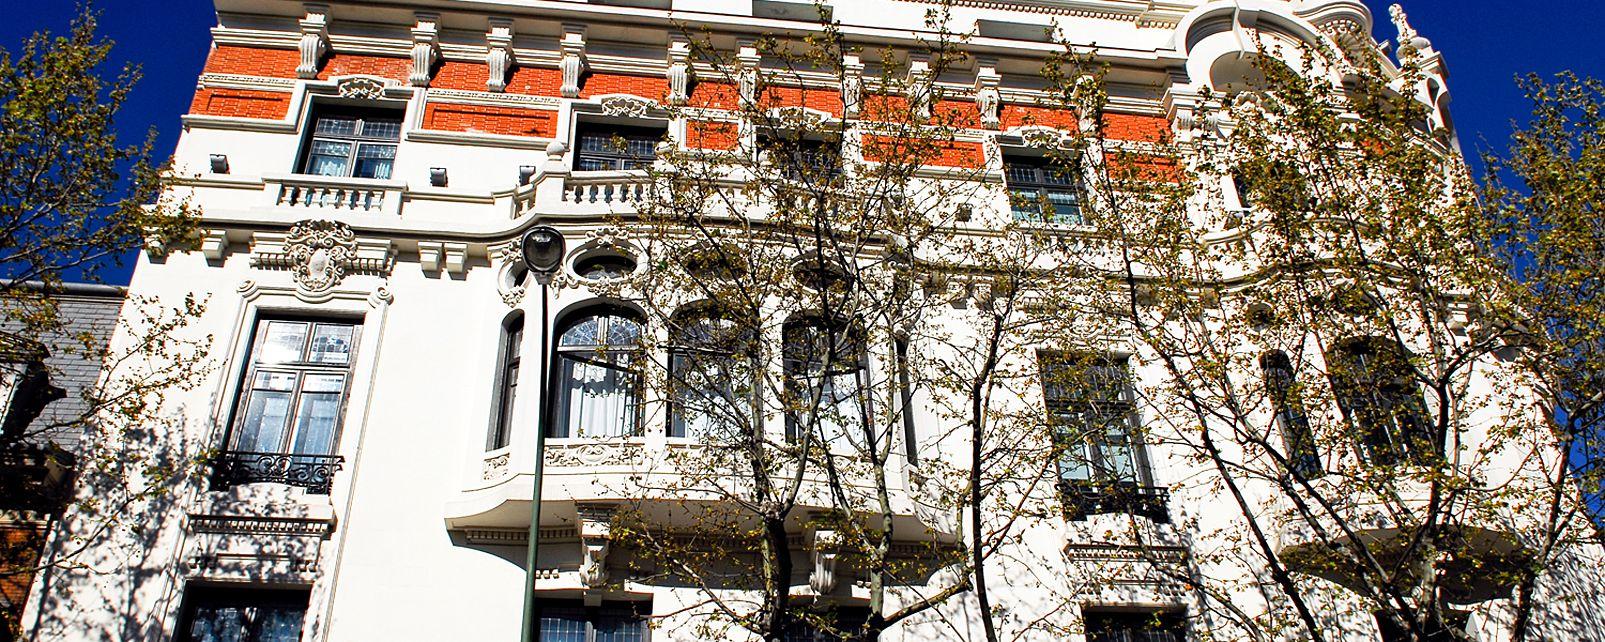 Hotel Palacio del Retiro